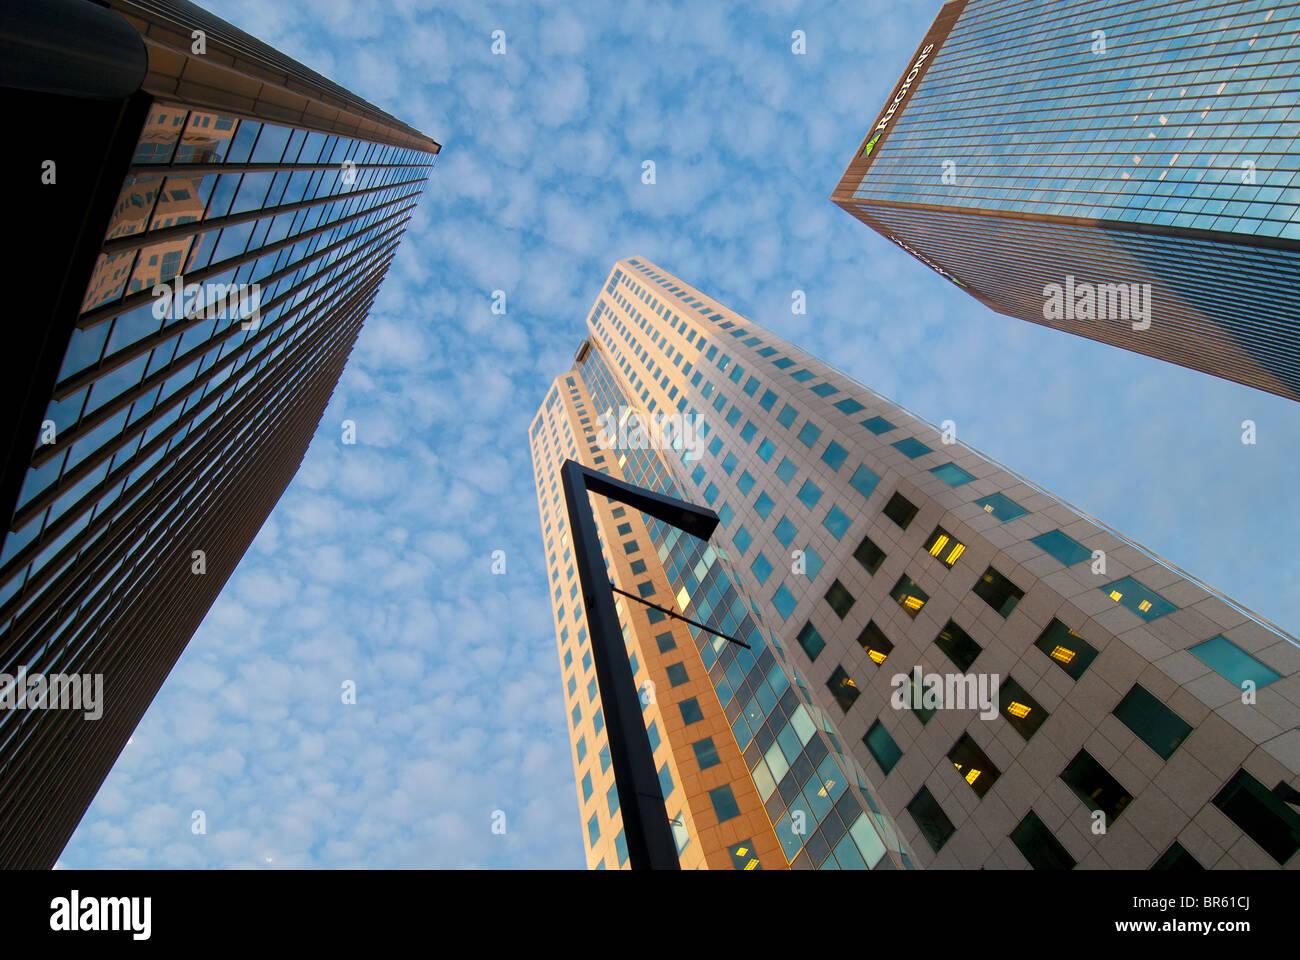 High-rise office buildings in Birmingham, Alabama, USA - Stock Image